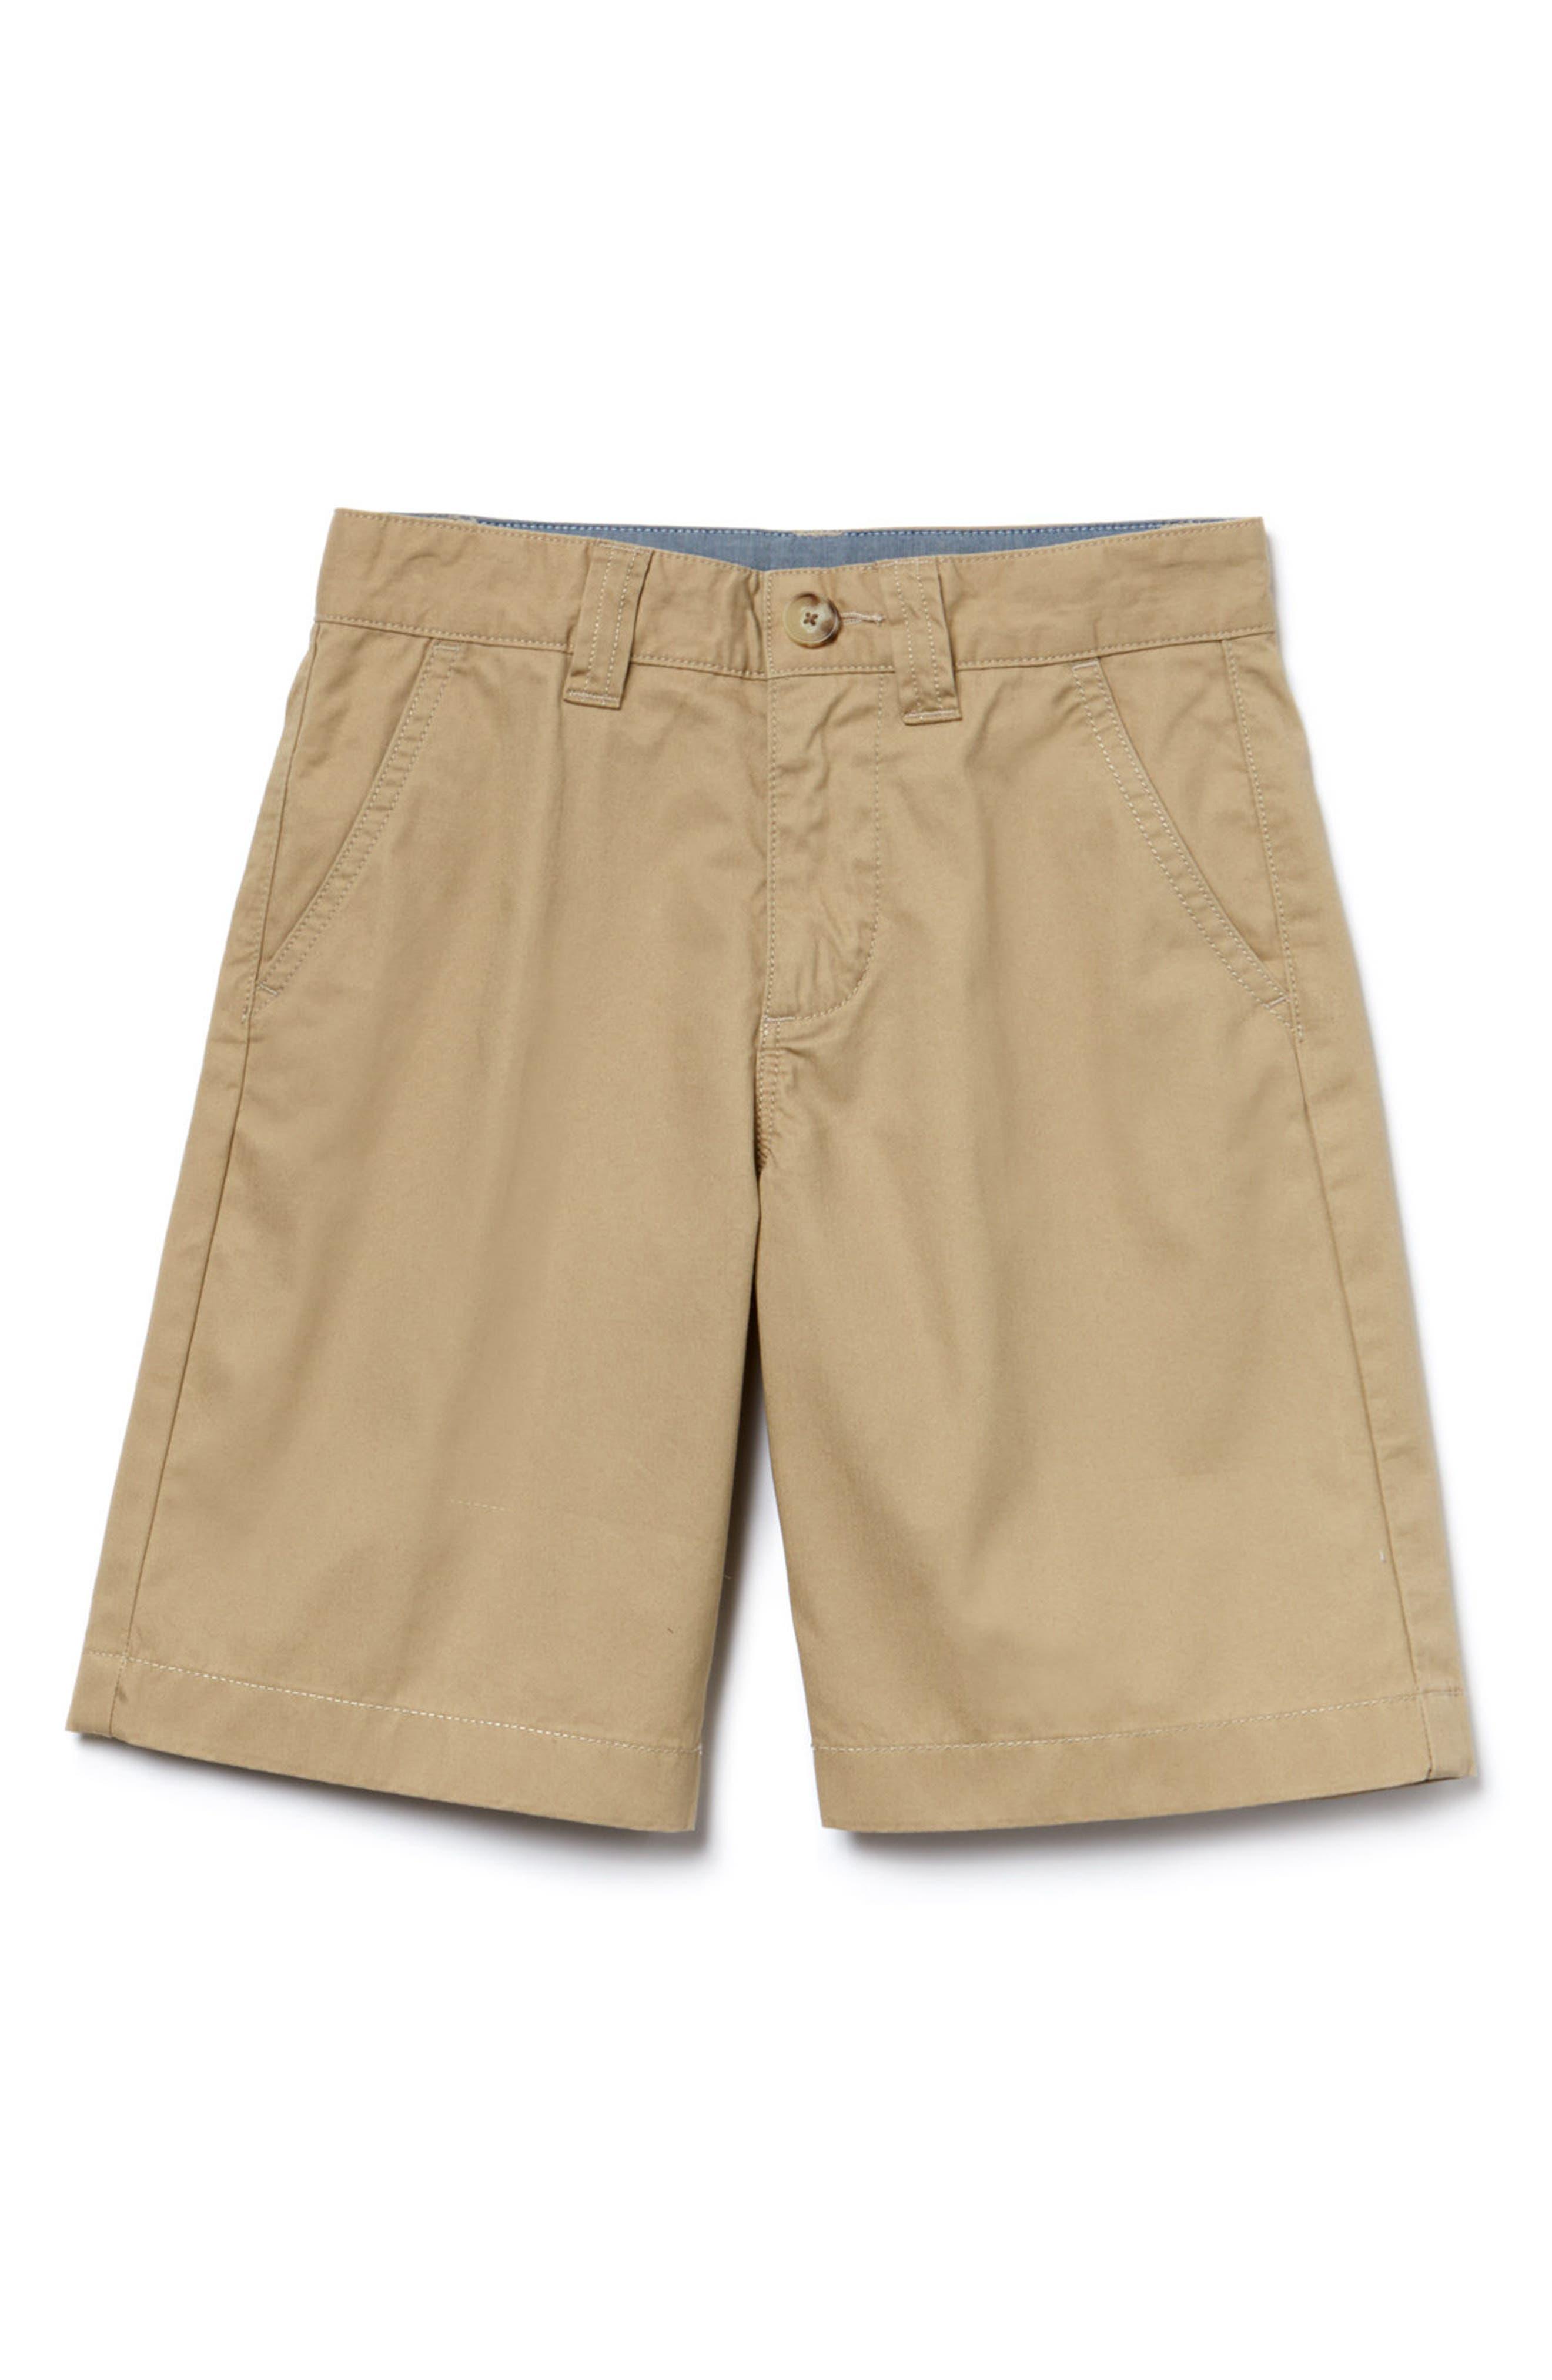 LACOSTE,                             Classic Bermuda Shorts,                             Main thumbnail 1, color,                             200